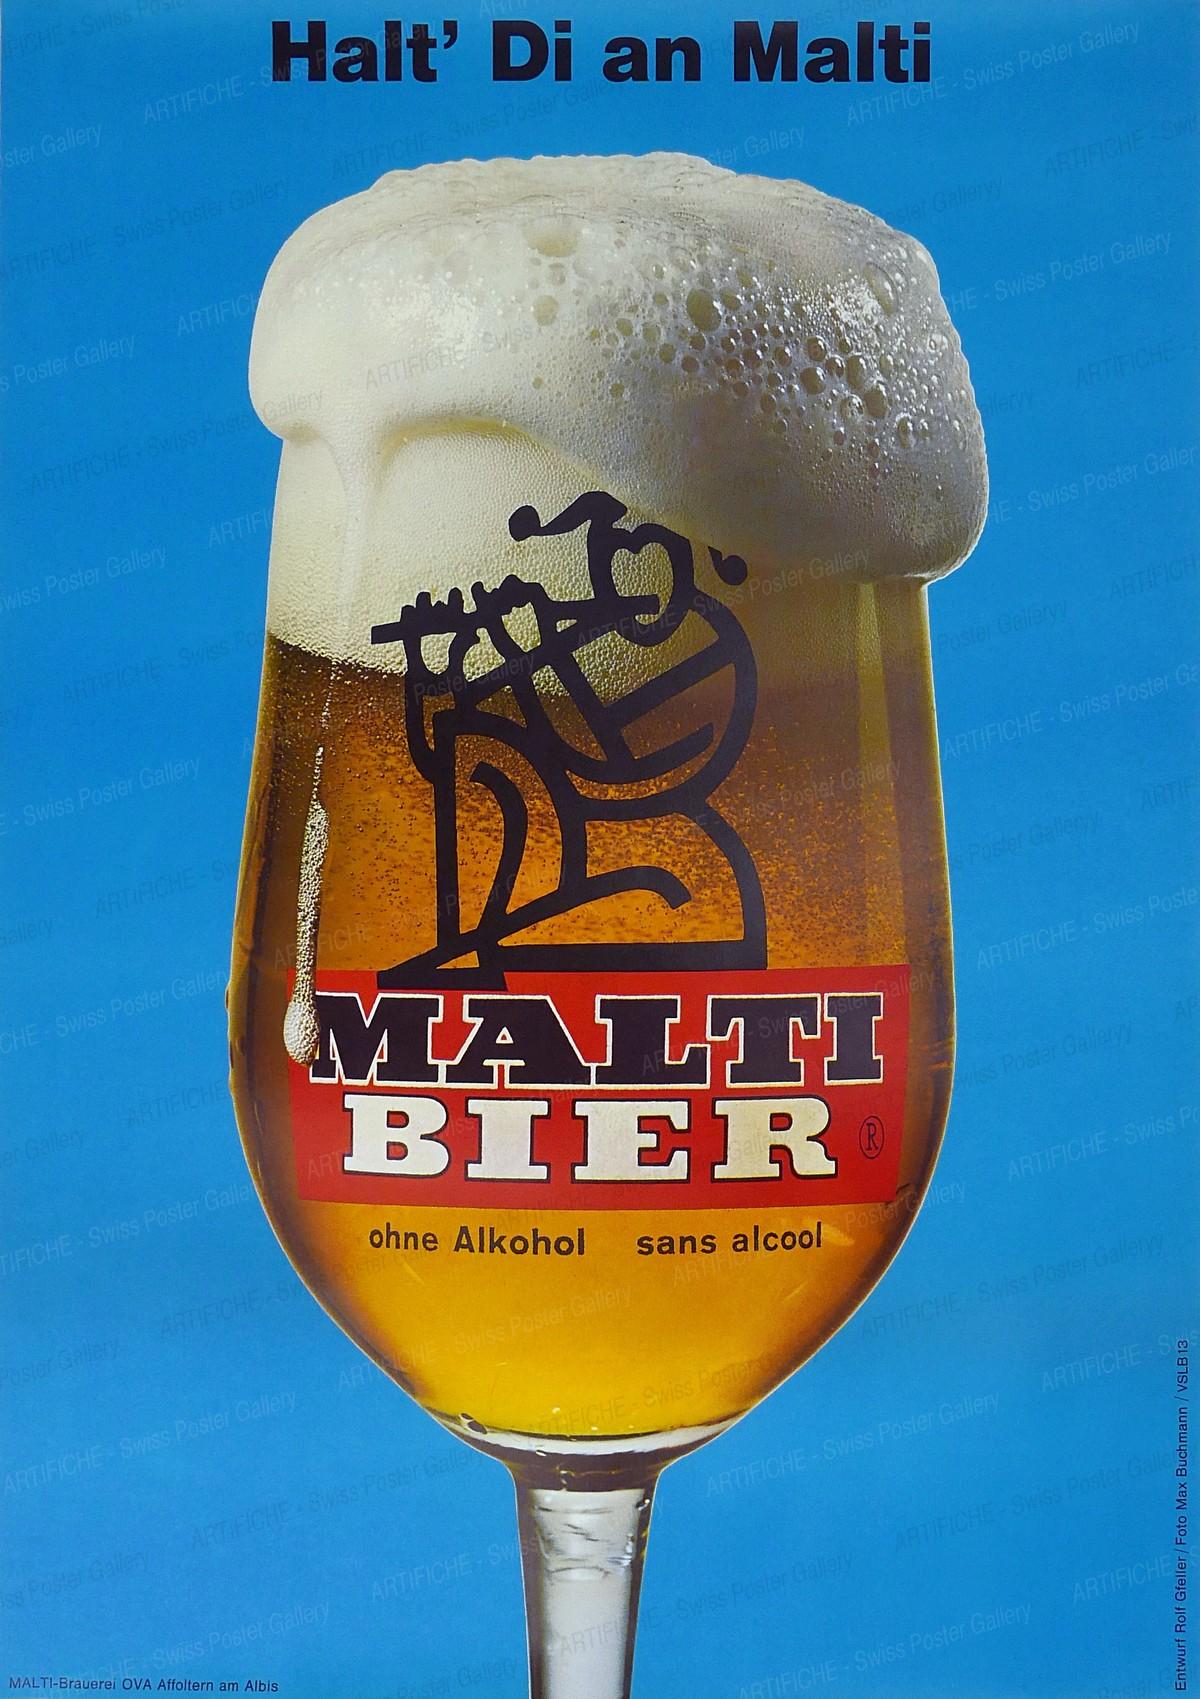 Halt' Di an Malti – Malti Bier – ohne Alkohol, Rolf Gfeller